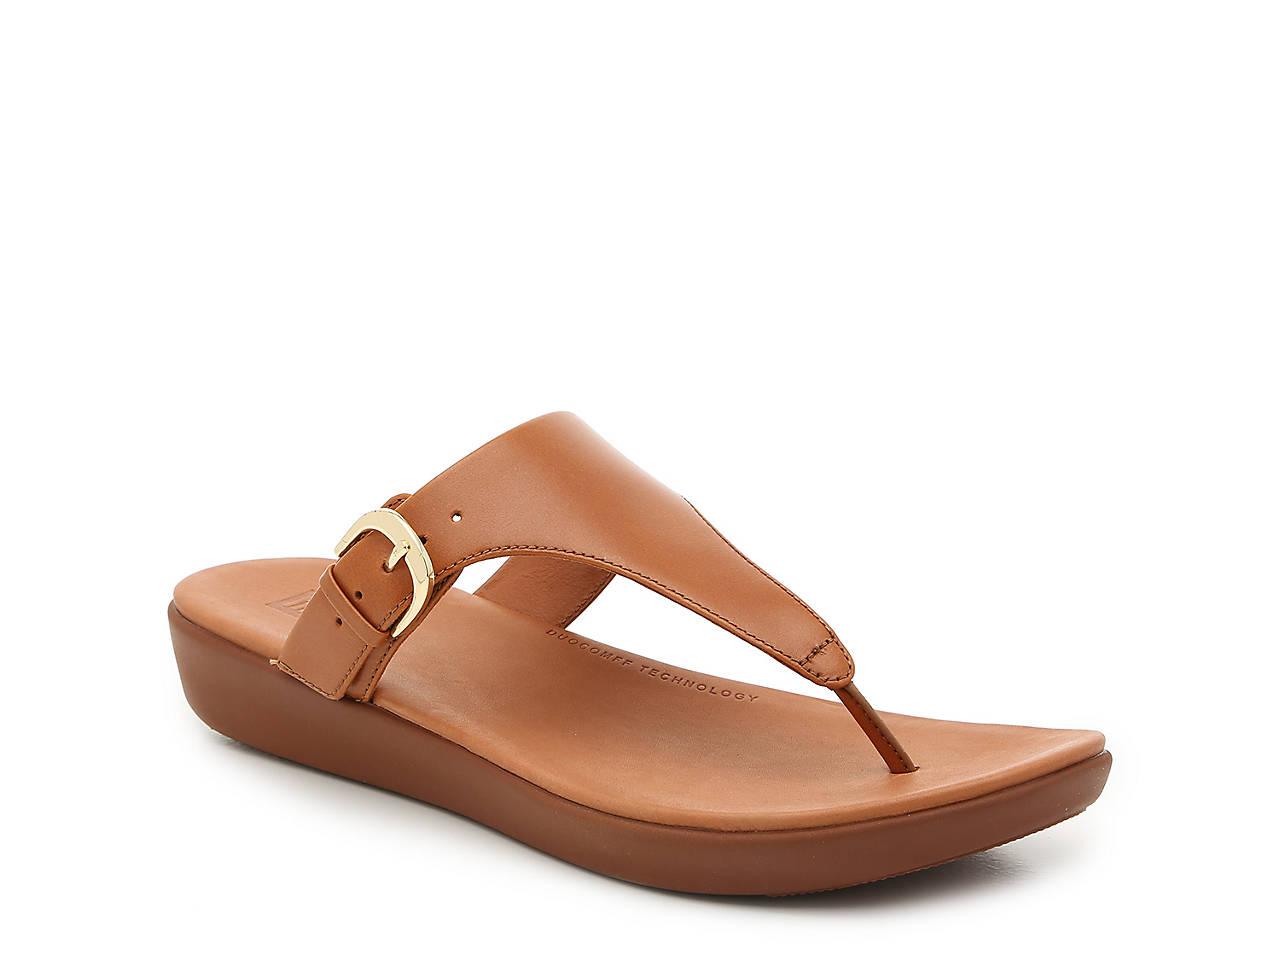 465170026 FitFlop Banda II Wedge Sandal Women s Shoes